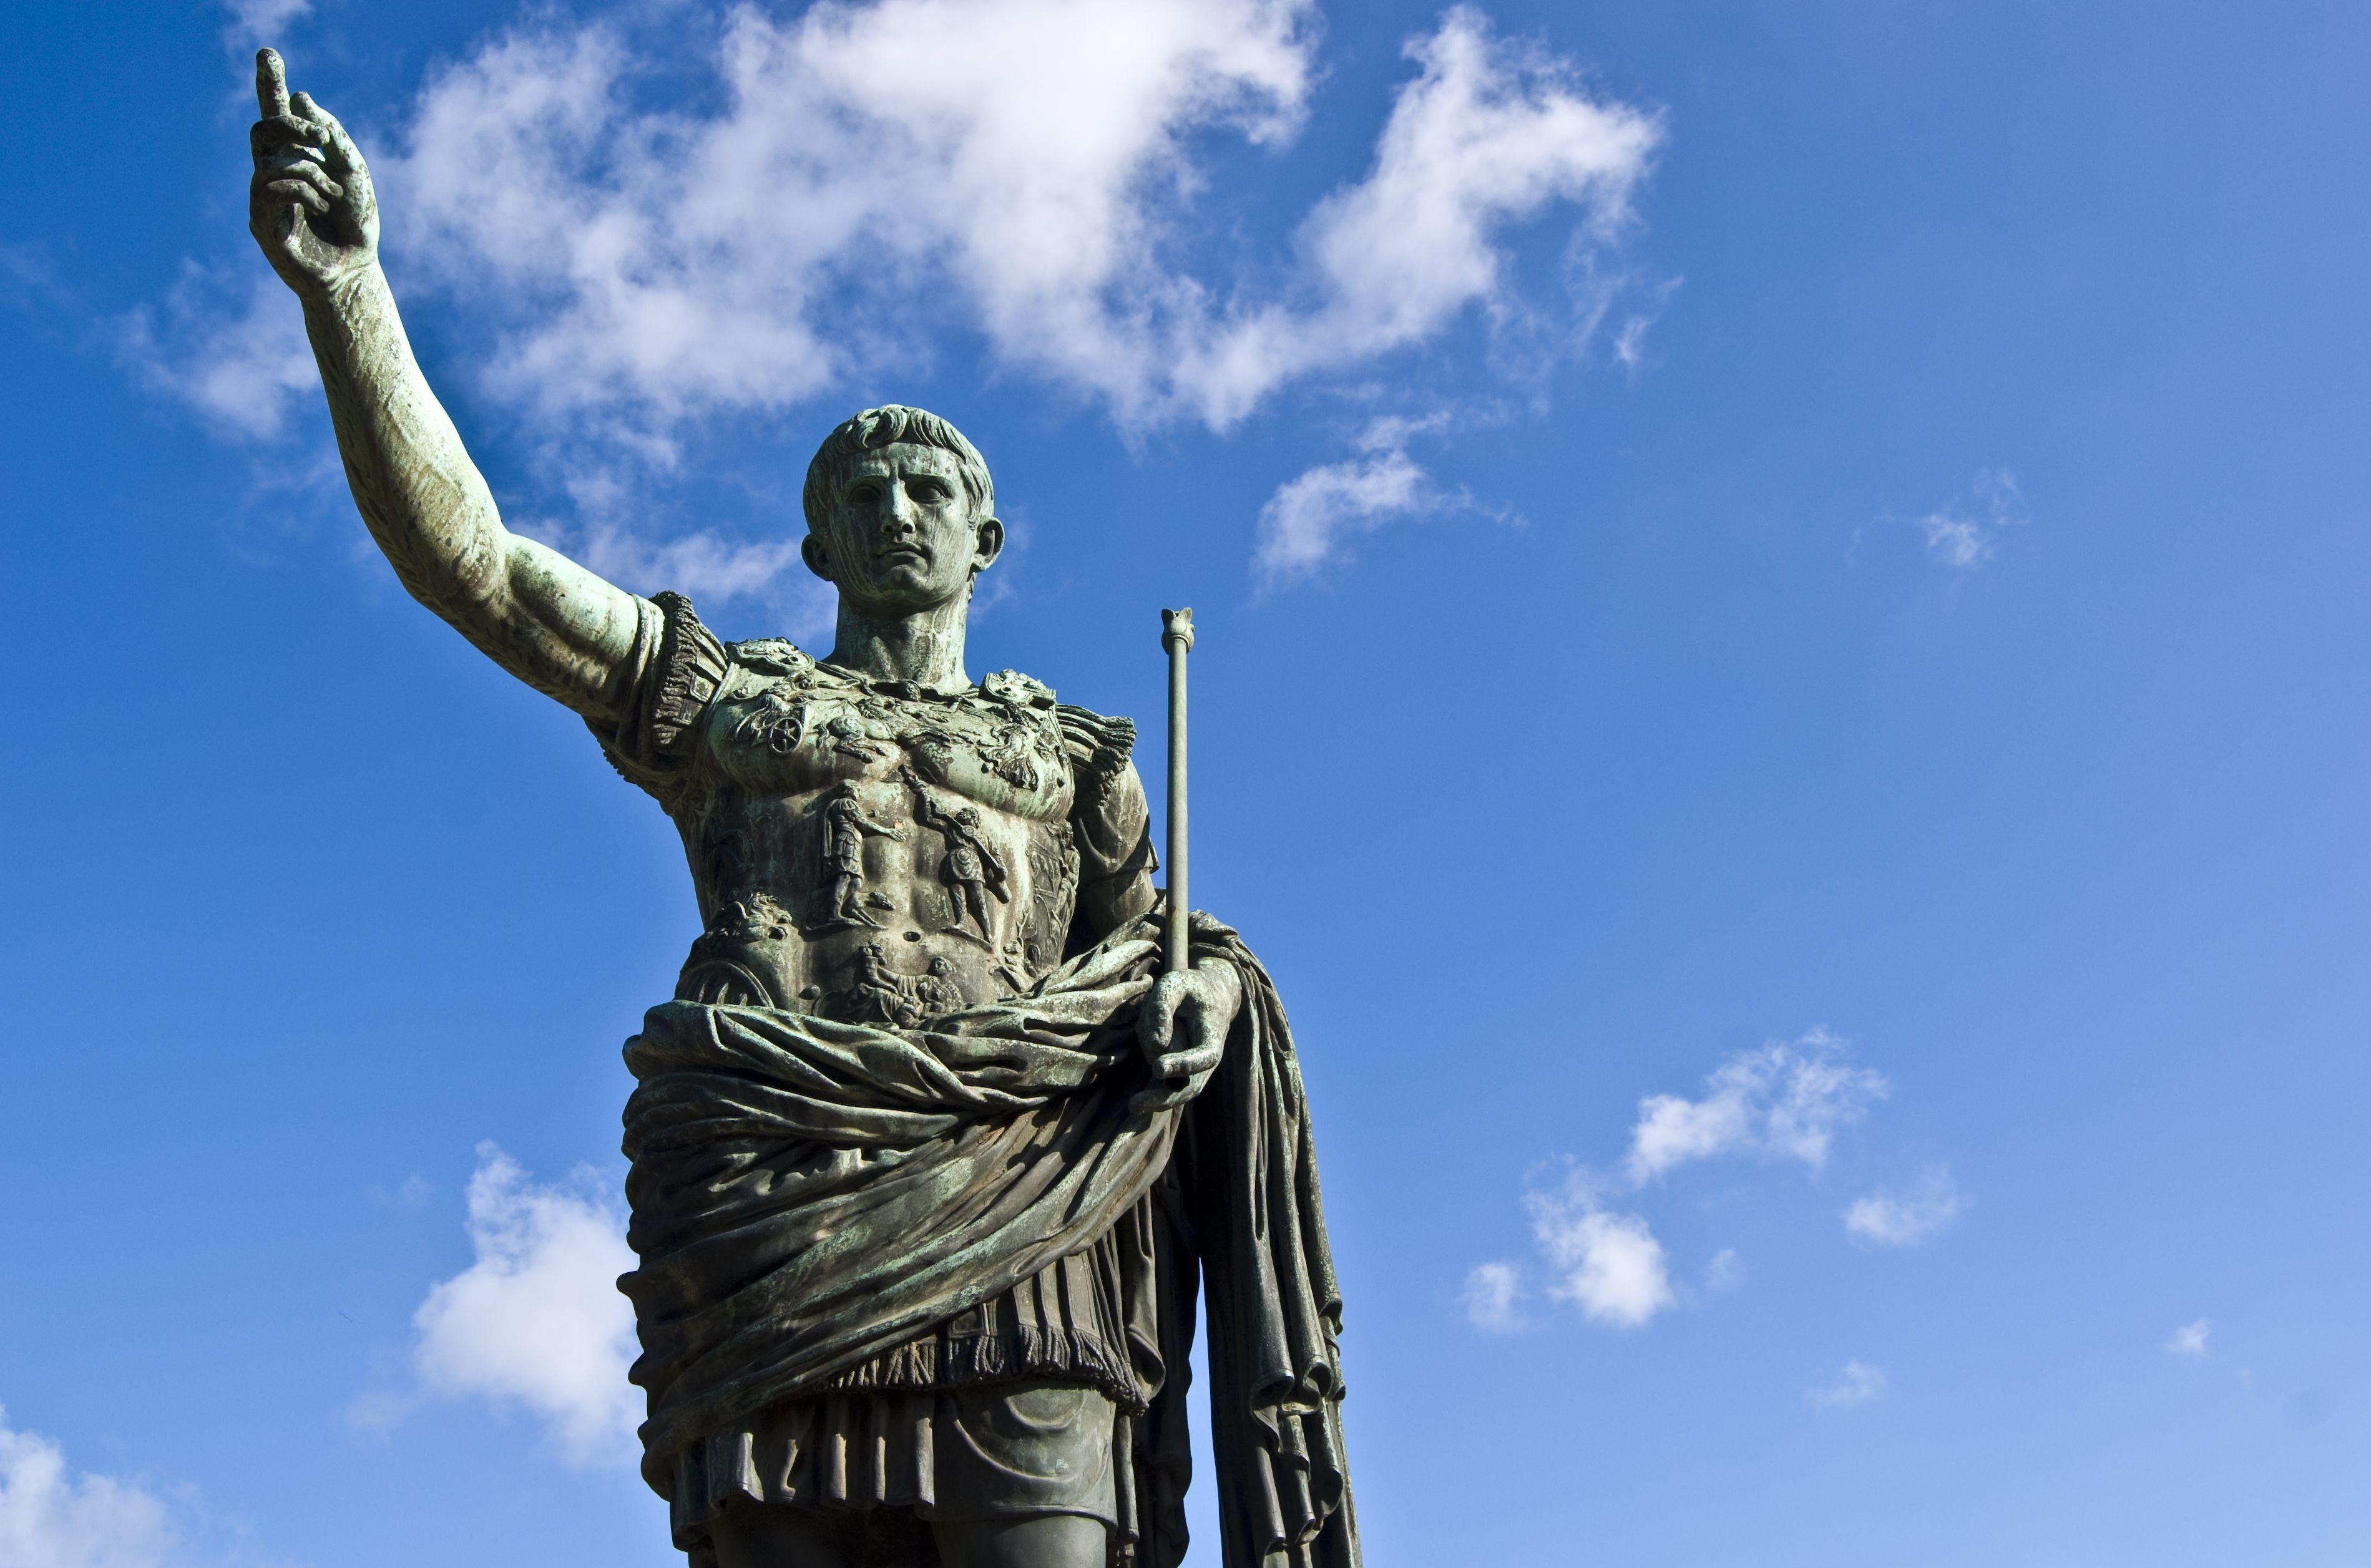 Statue of Julius Caesar against a blue sky.